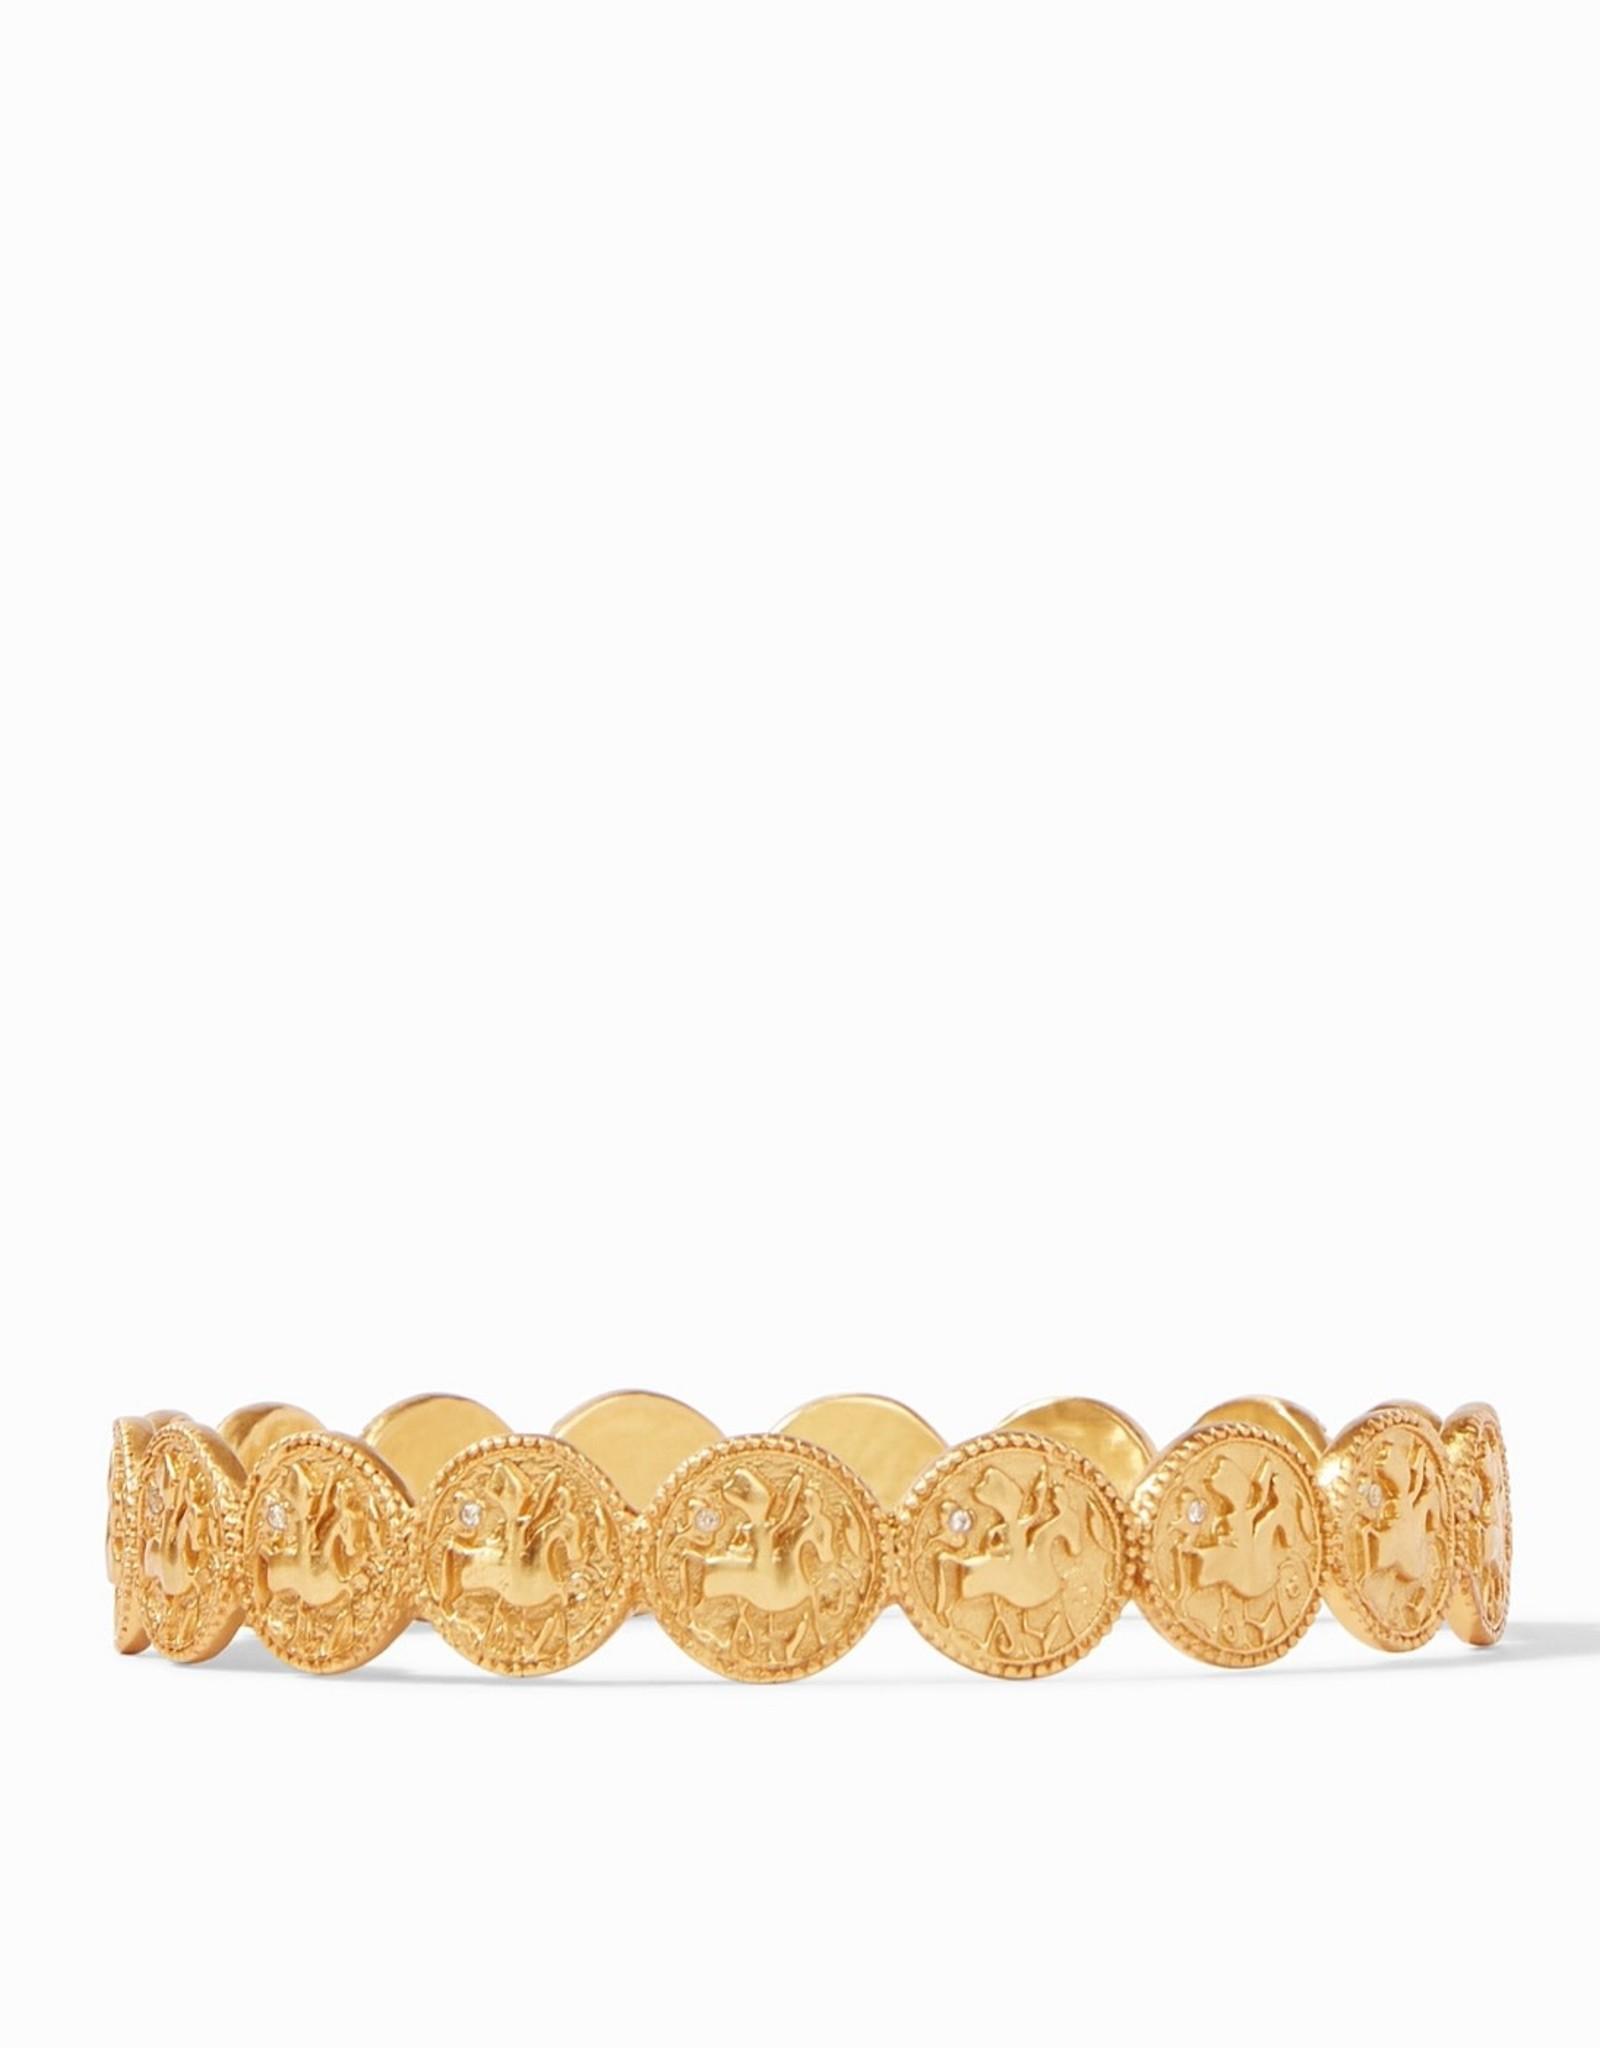 Julie Vos Coin Bangle Gold CZ - Medium